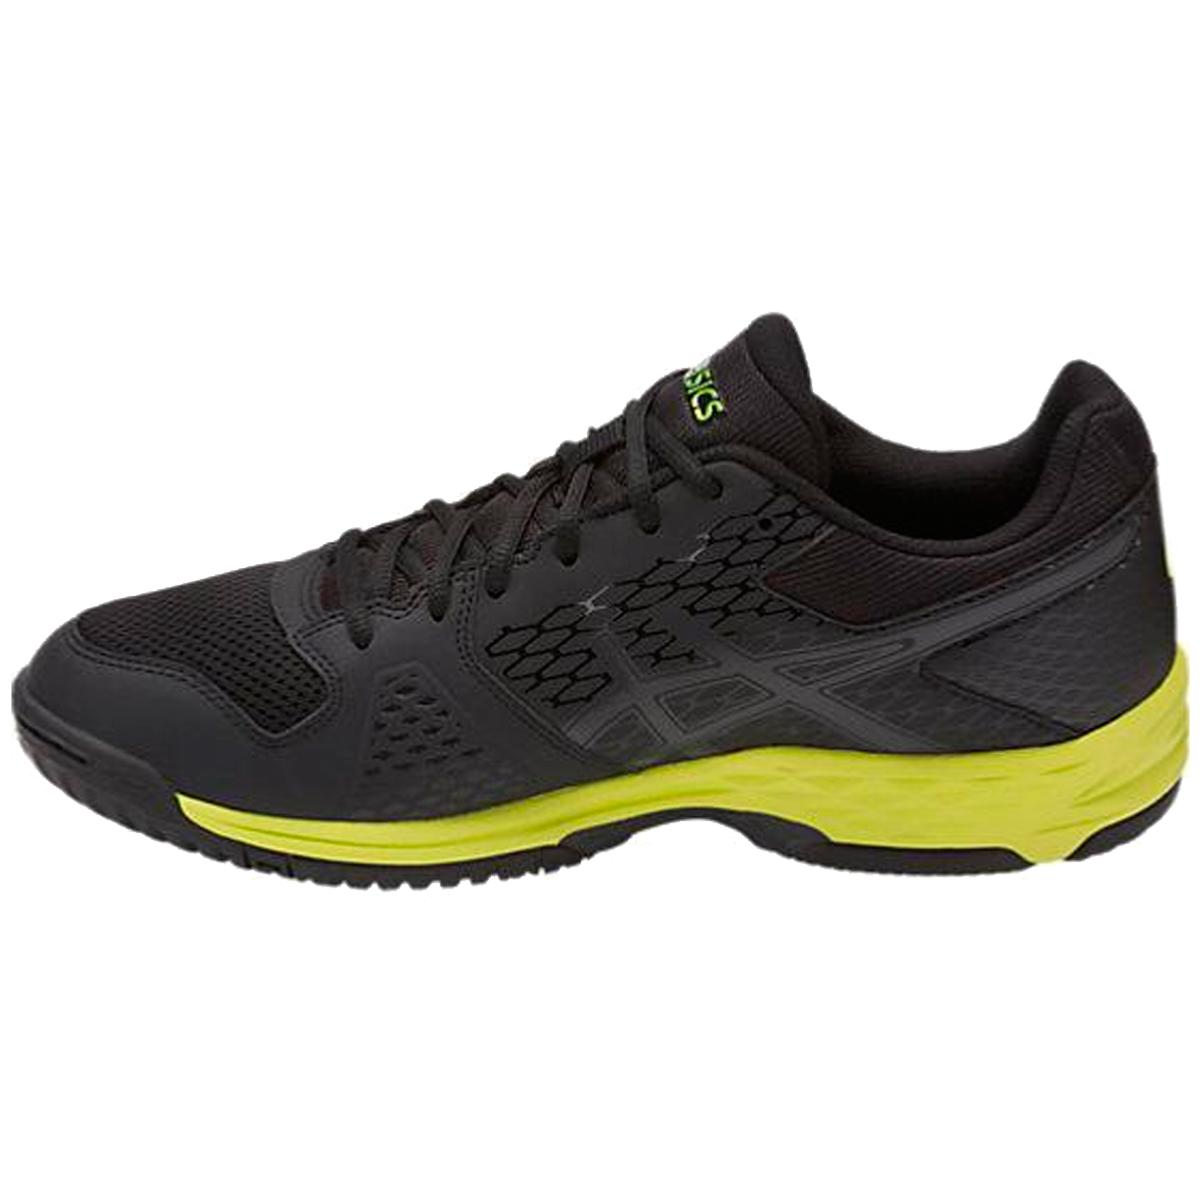 Buy Asics Gel Domain 4 Squash Shoes at